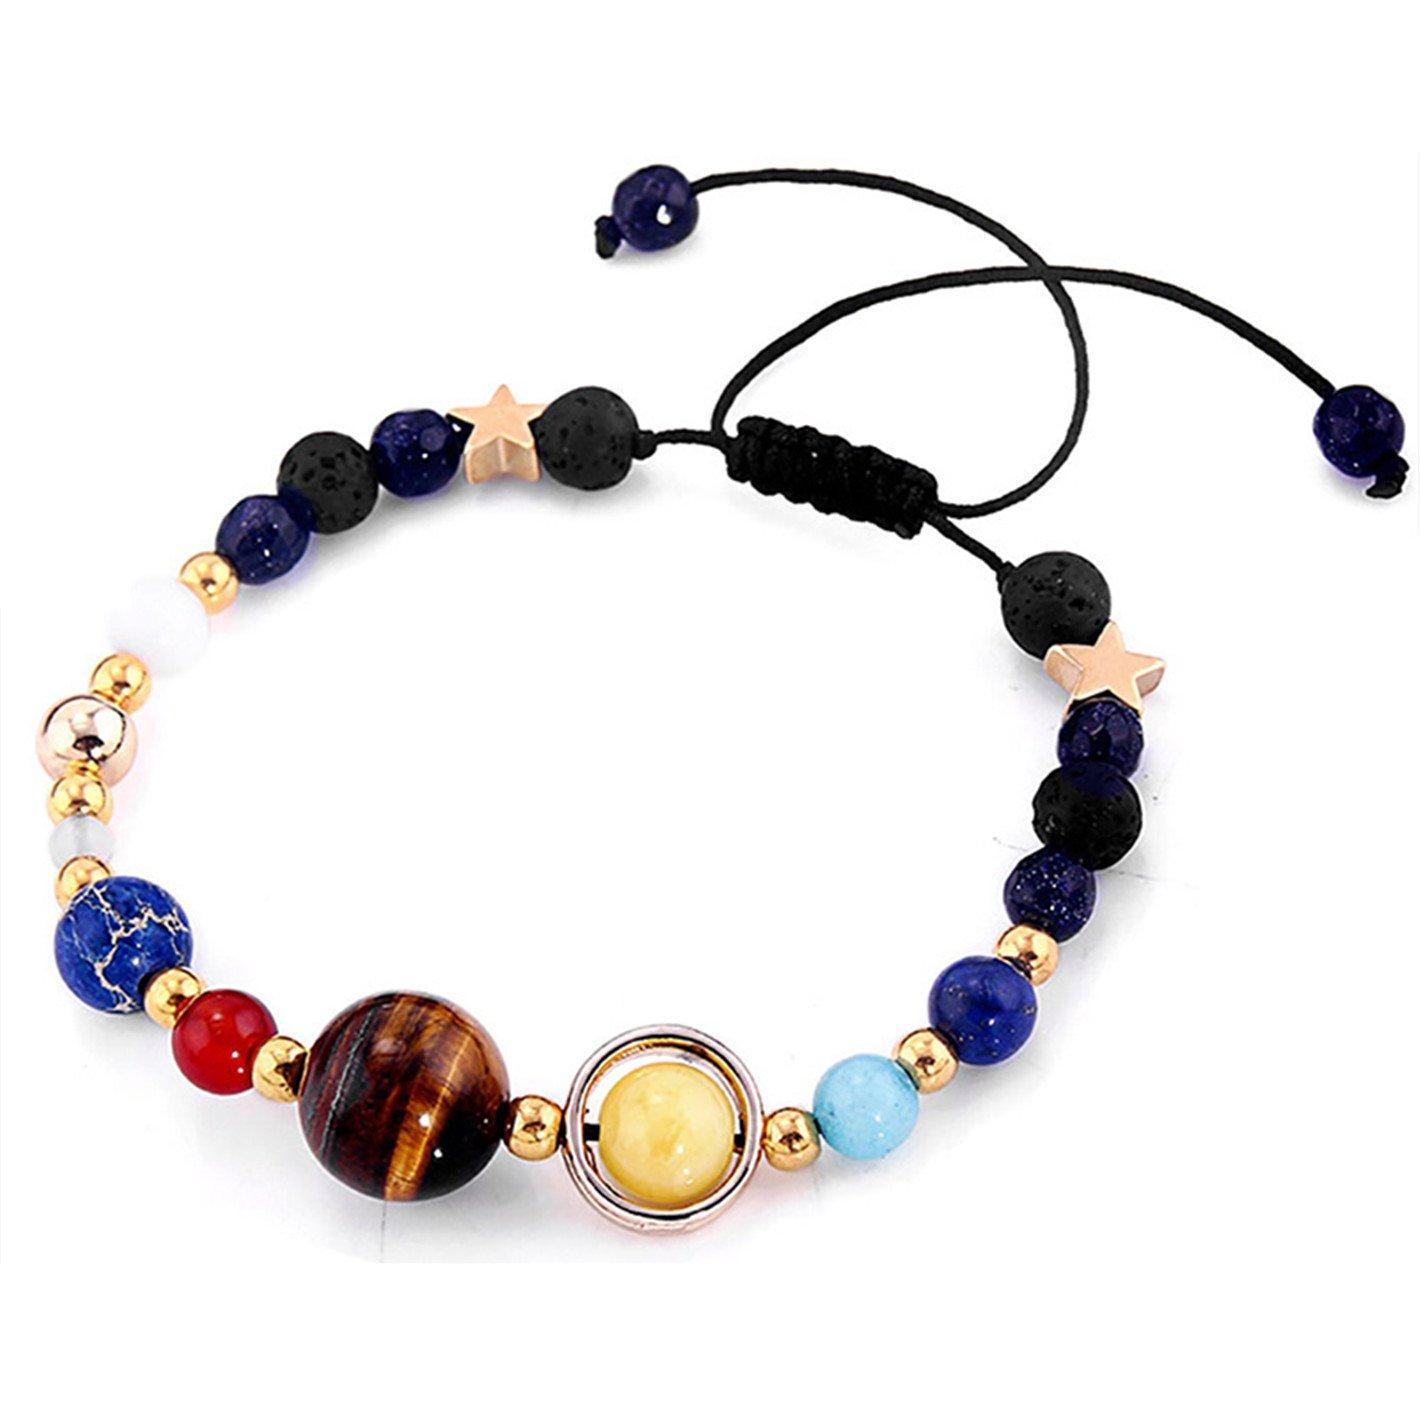 Universe Planets Beads Bangles & Bracelets Fashion Jewelry Natural Solar System Energy Bracelet for Women